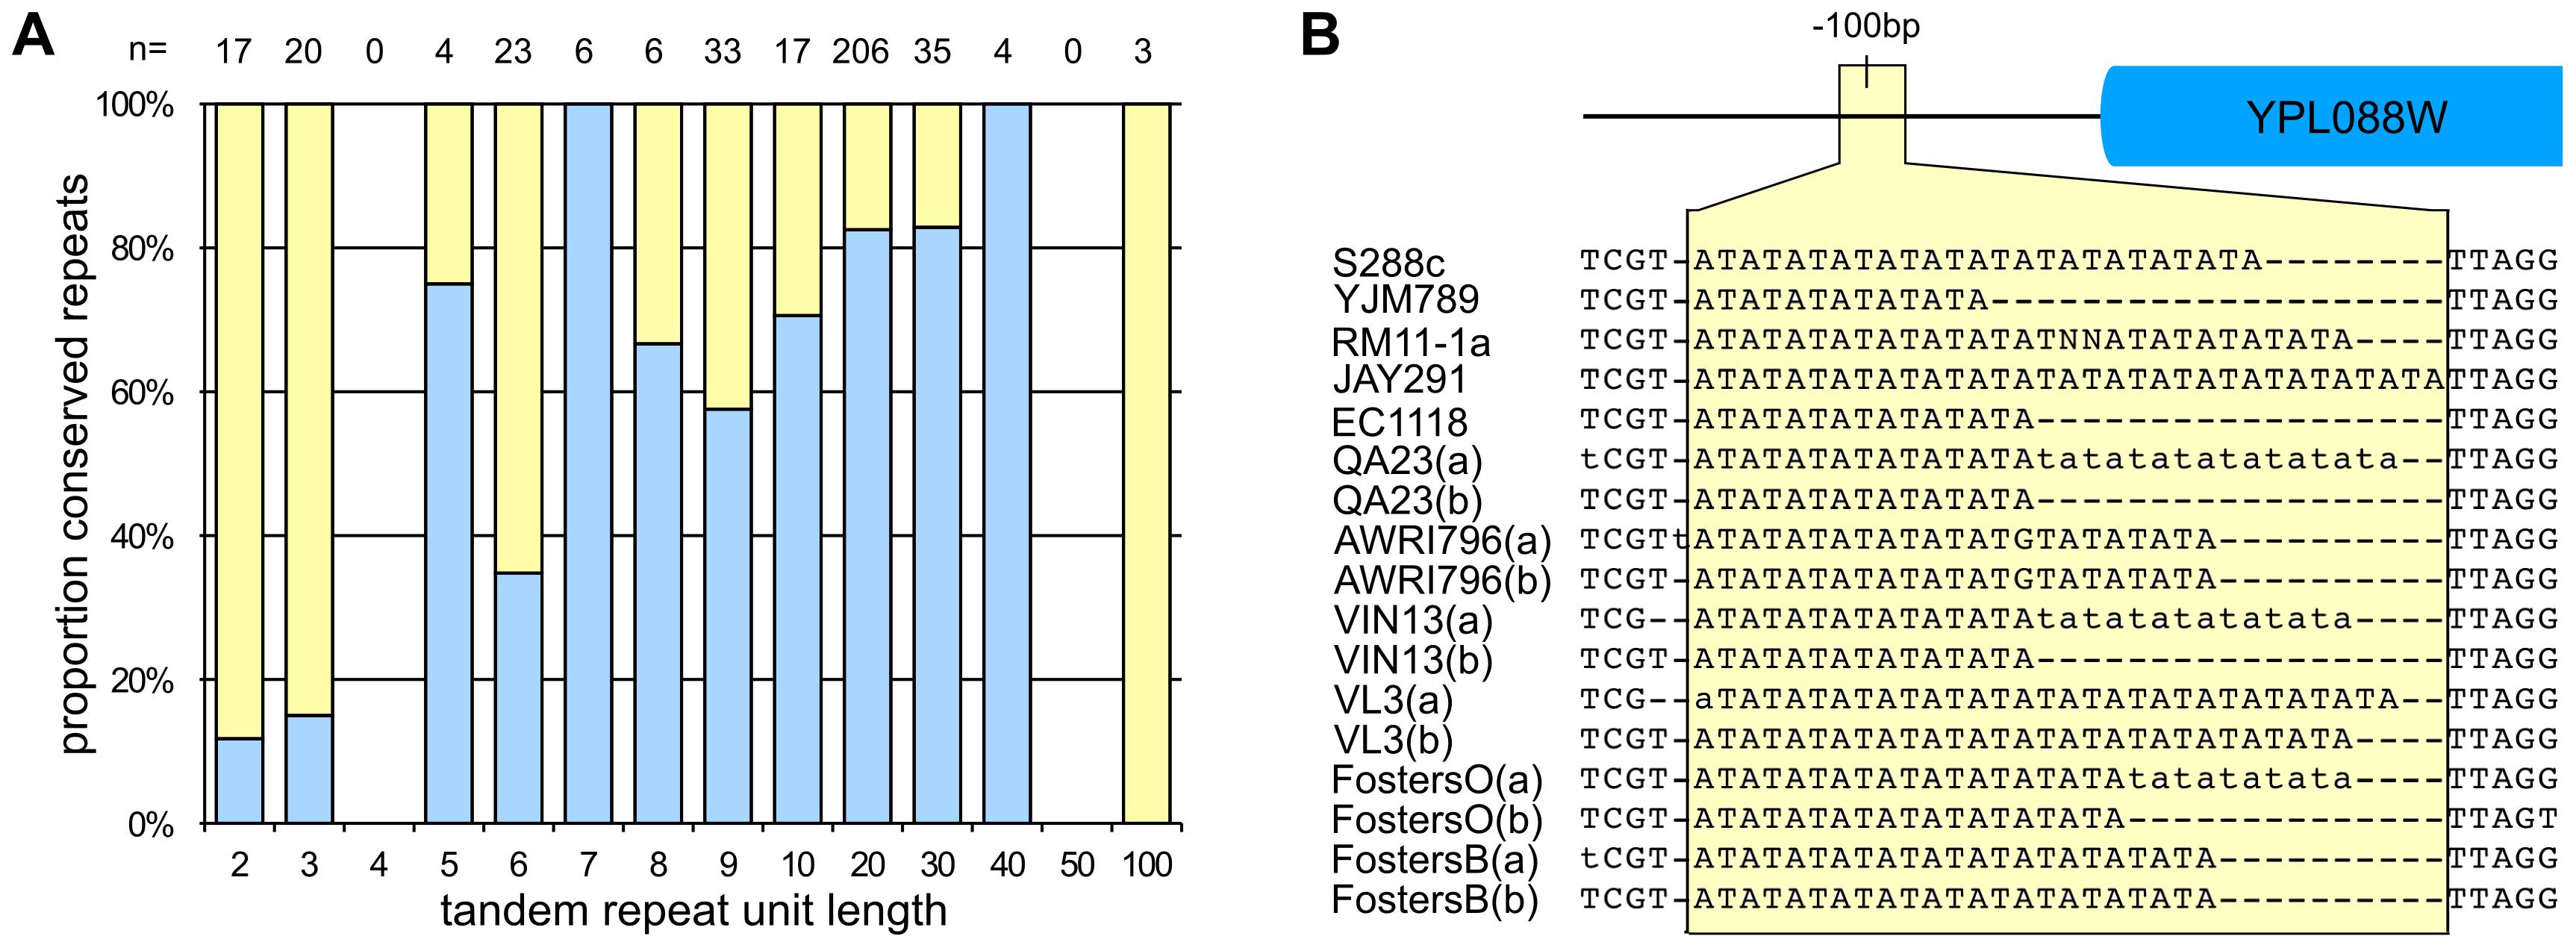 Nucleotide variation in <i>S. cerevisiae</i>.